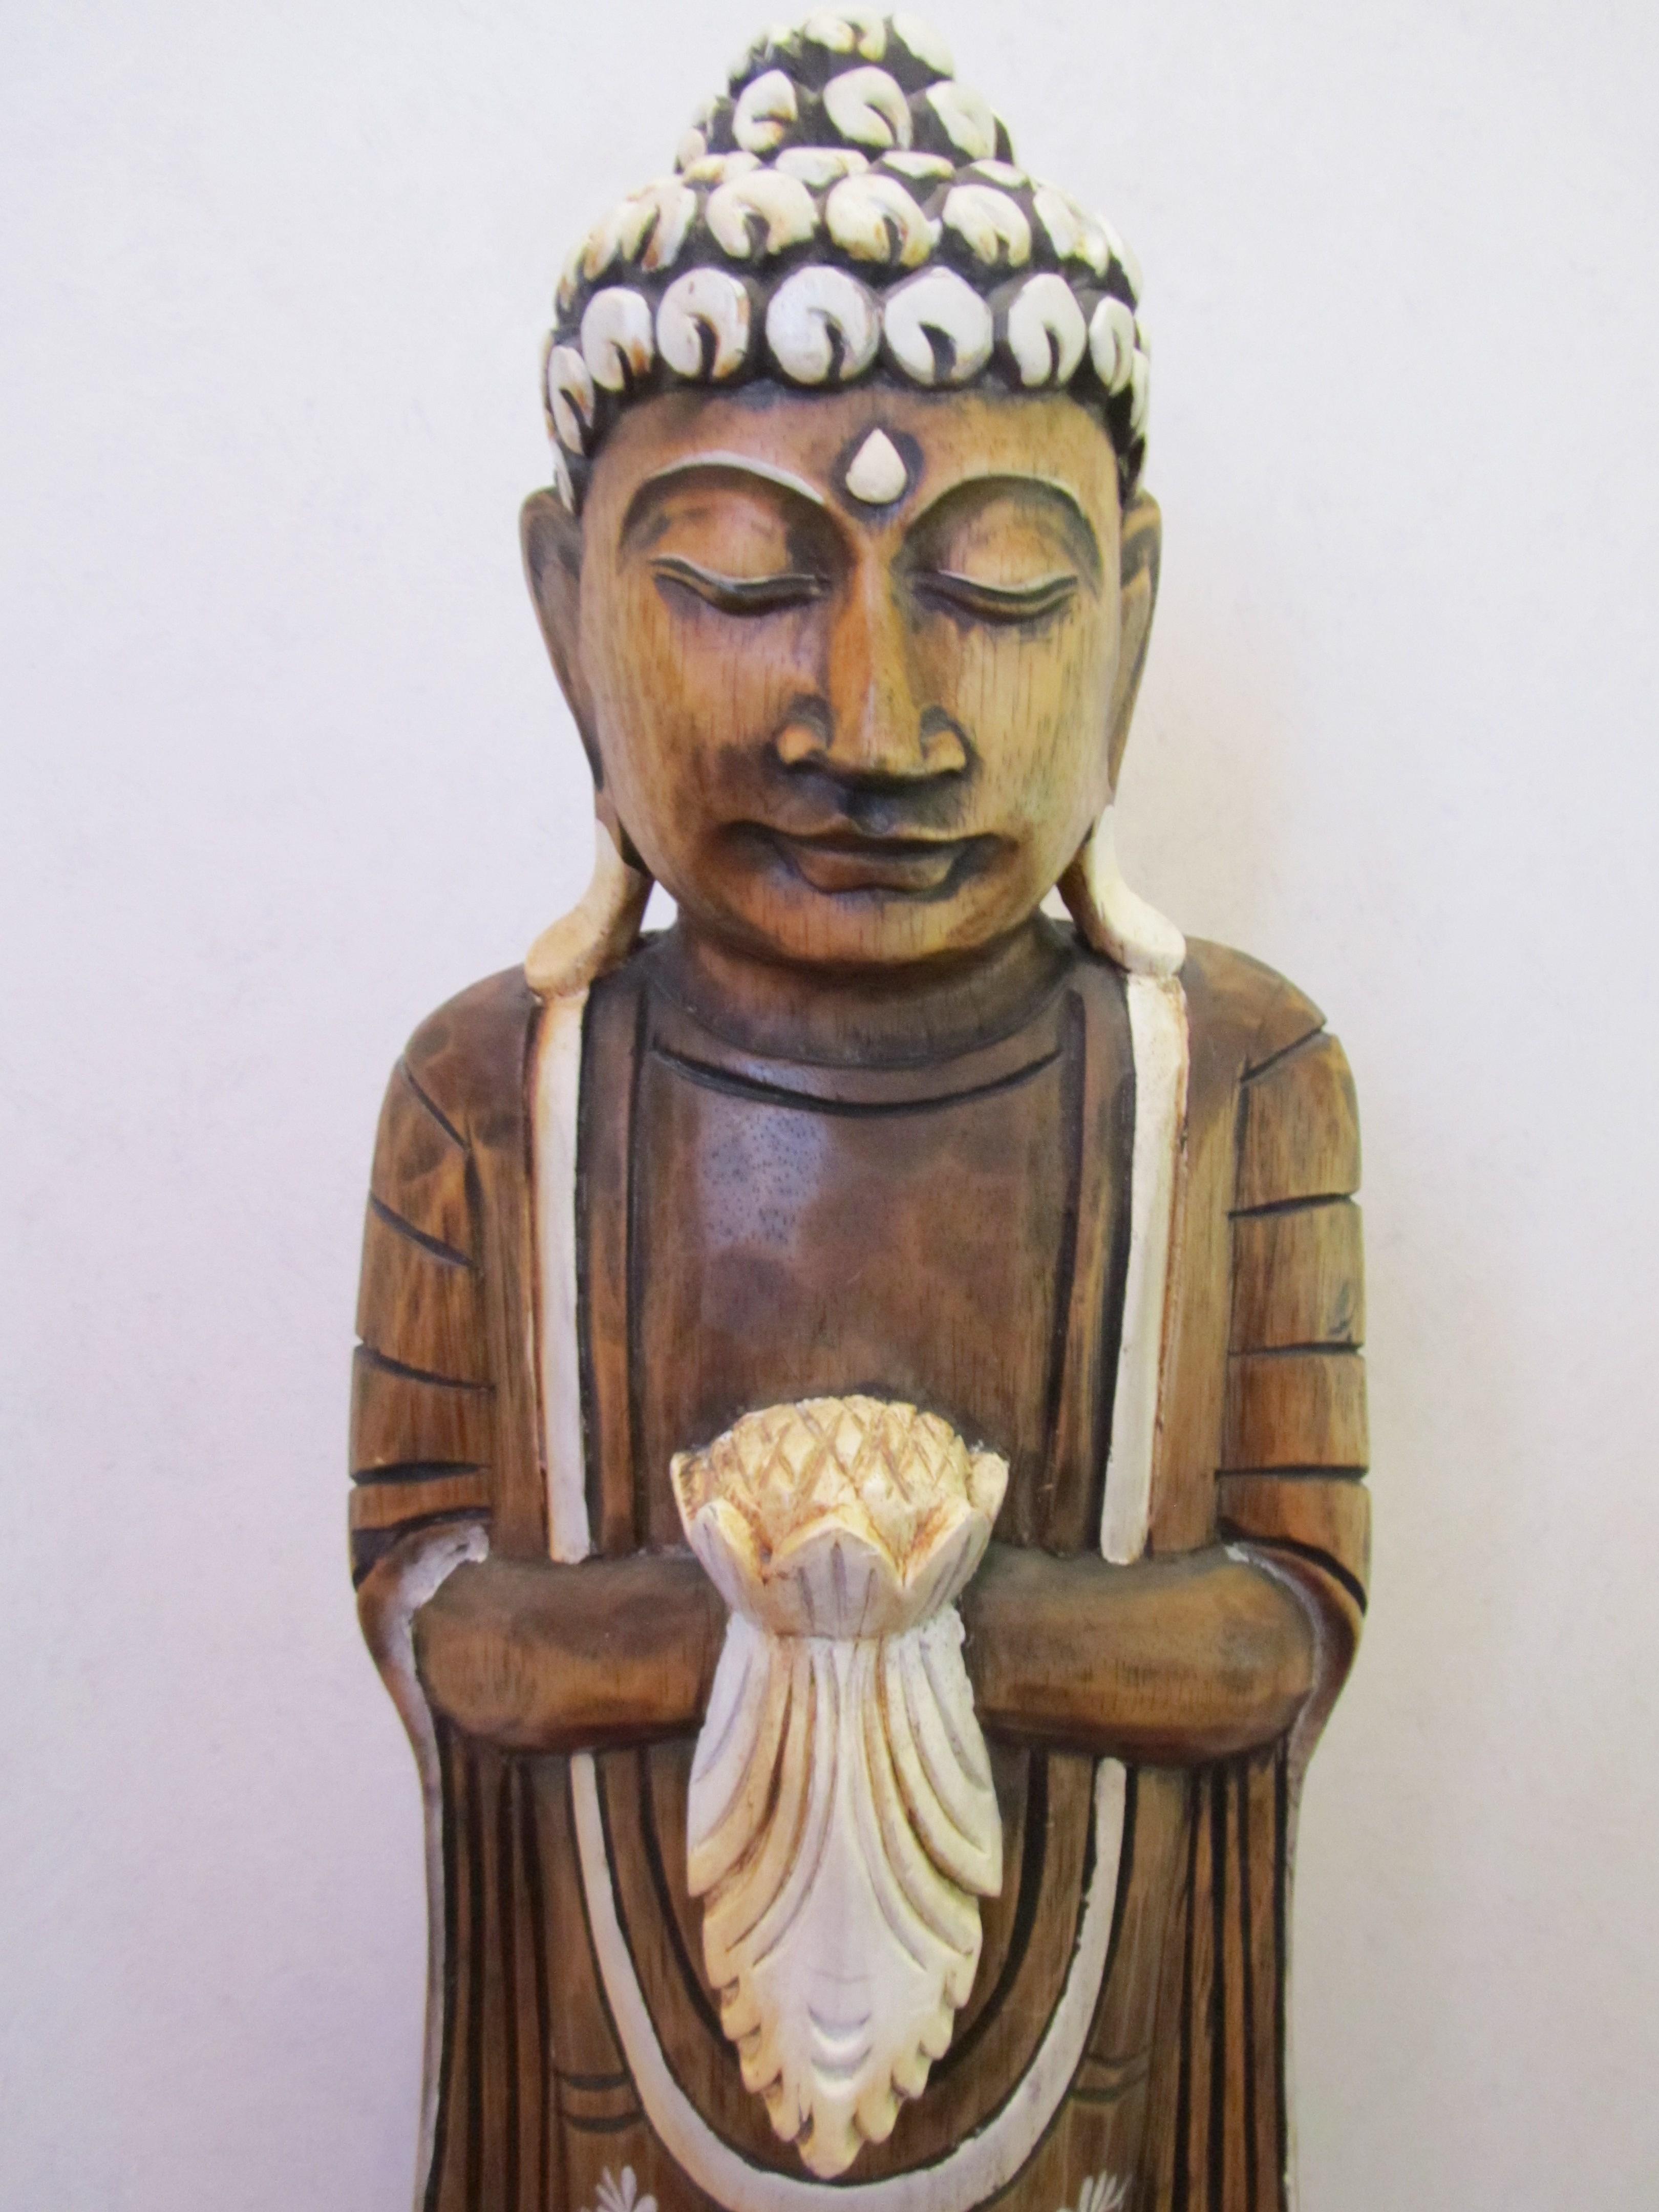 guérande la baule massage shiatsu reflexologie bien être cadeau zen 3